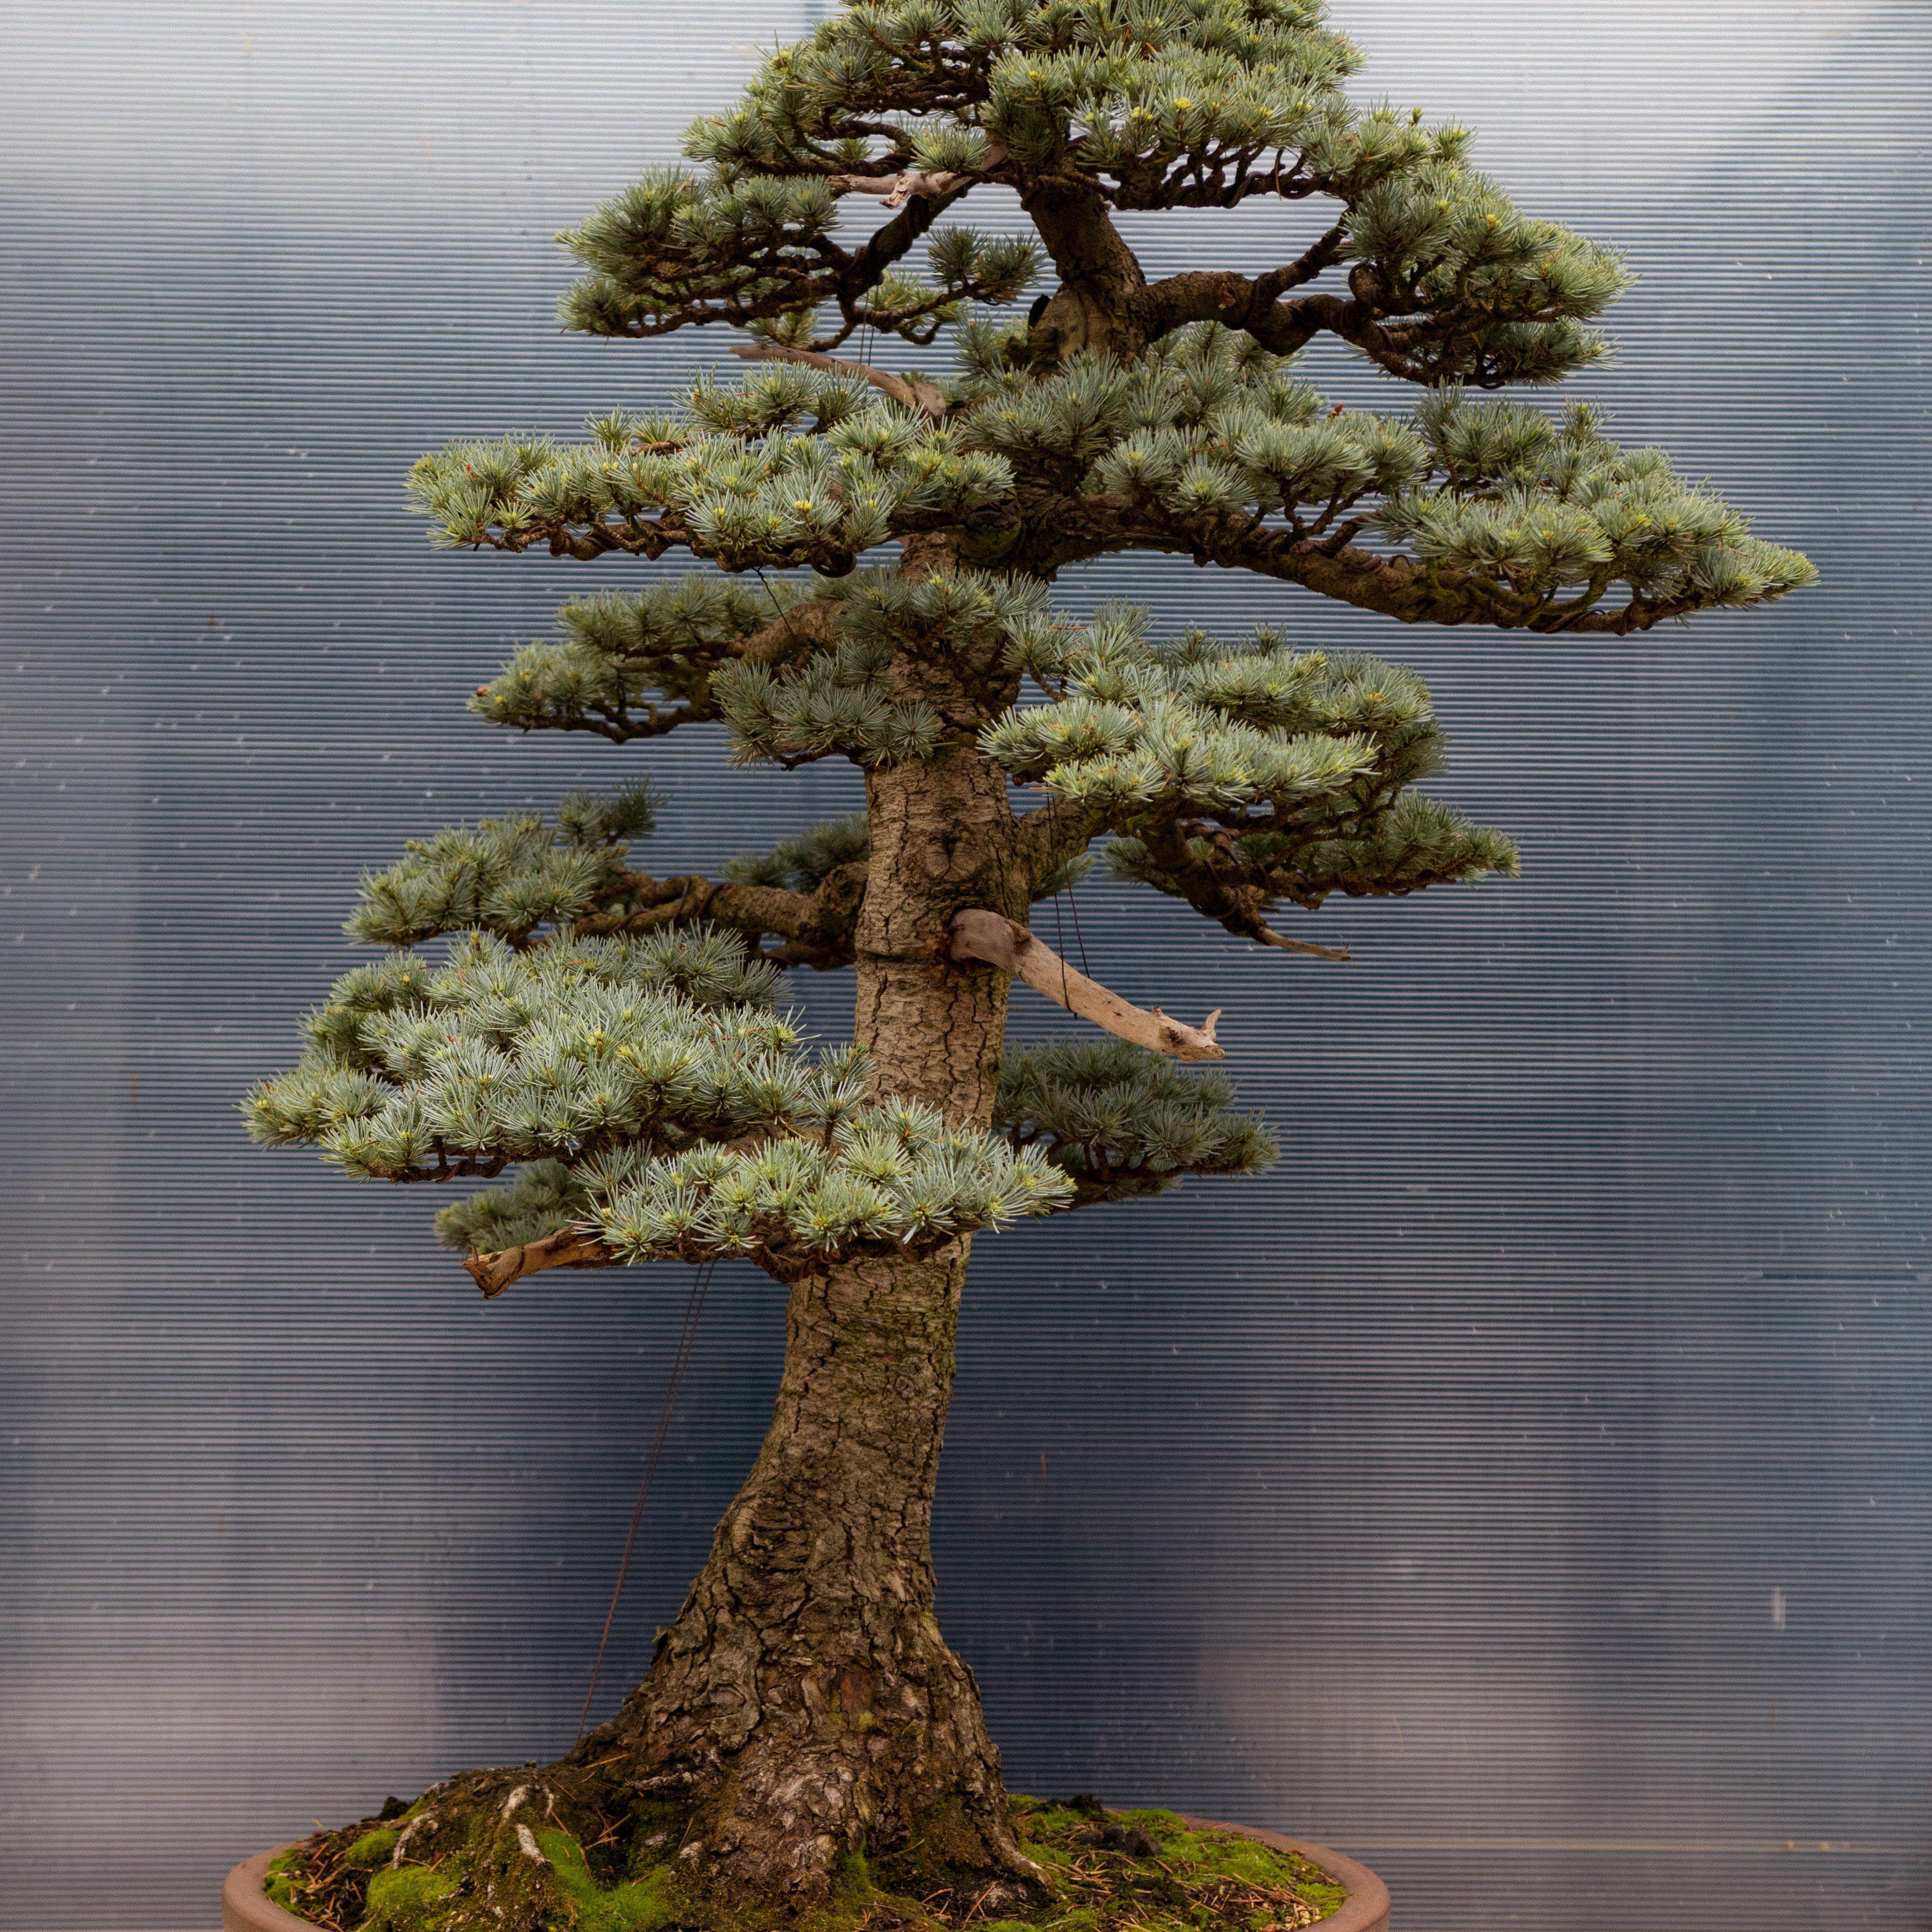 Bonsai tree at the Pacific Rim Bonsai Center